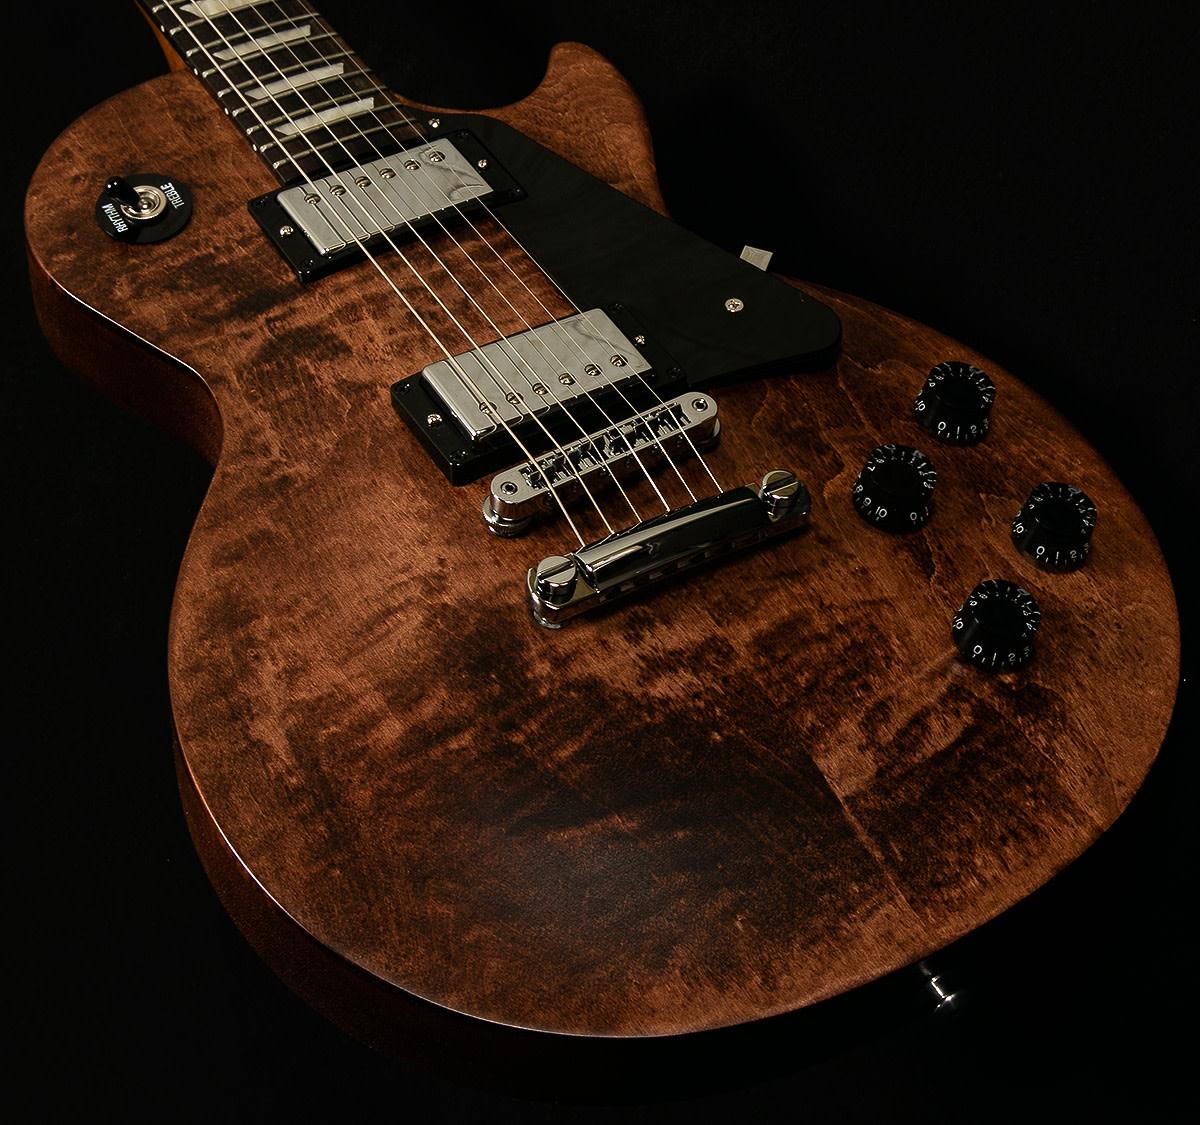 5 best gibson les paul guitars under a thousand dollars 2015 2017 hubpages. Black Bedroom Furniture Sets. Home Design Ideas